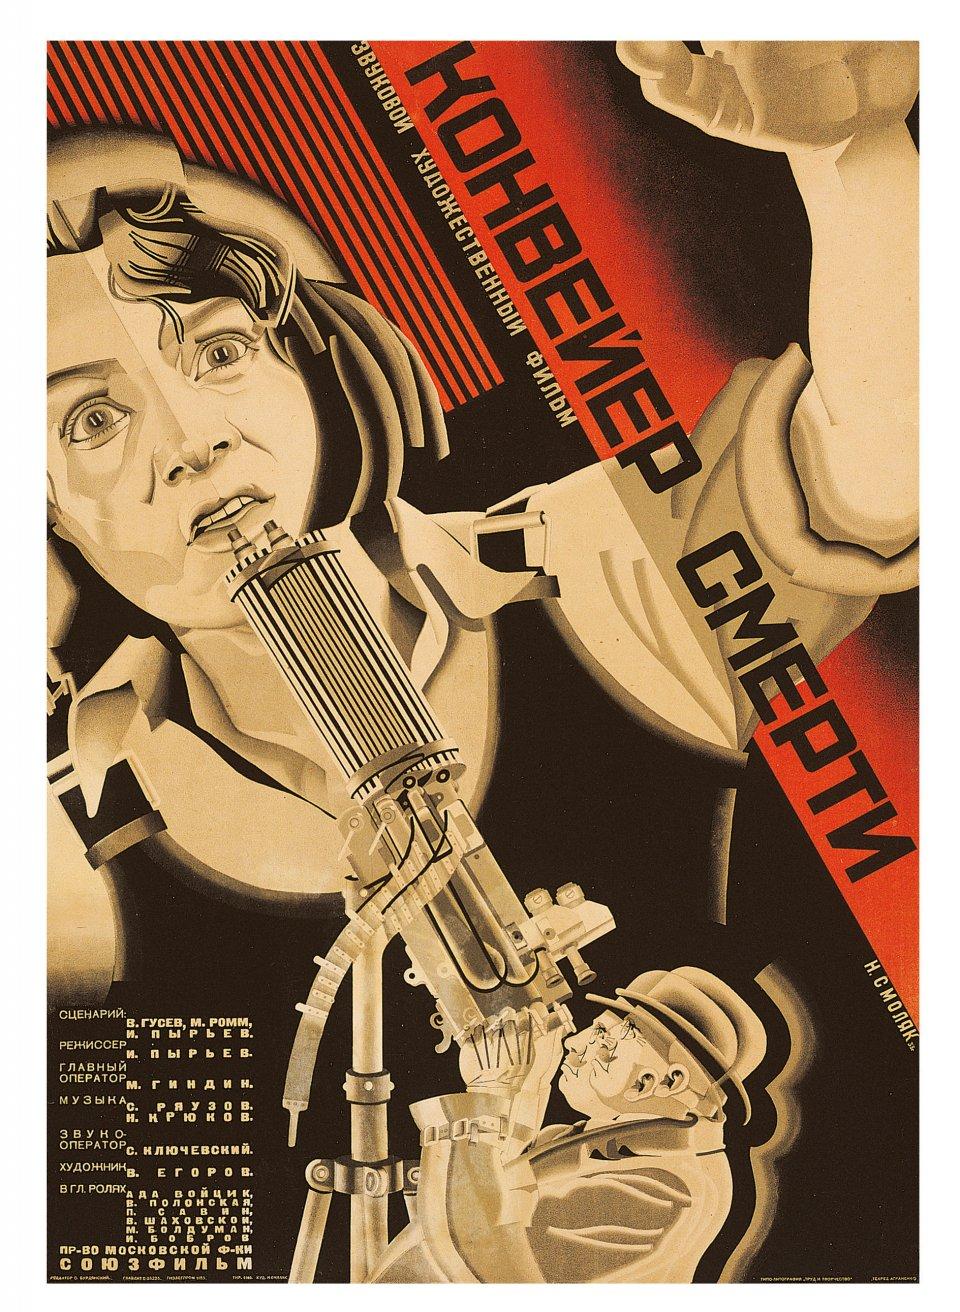 Soviet film posters swap Hollywood glamour for avant-garde